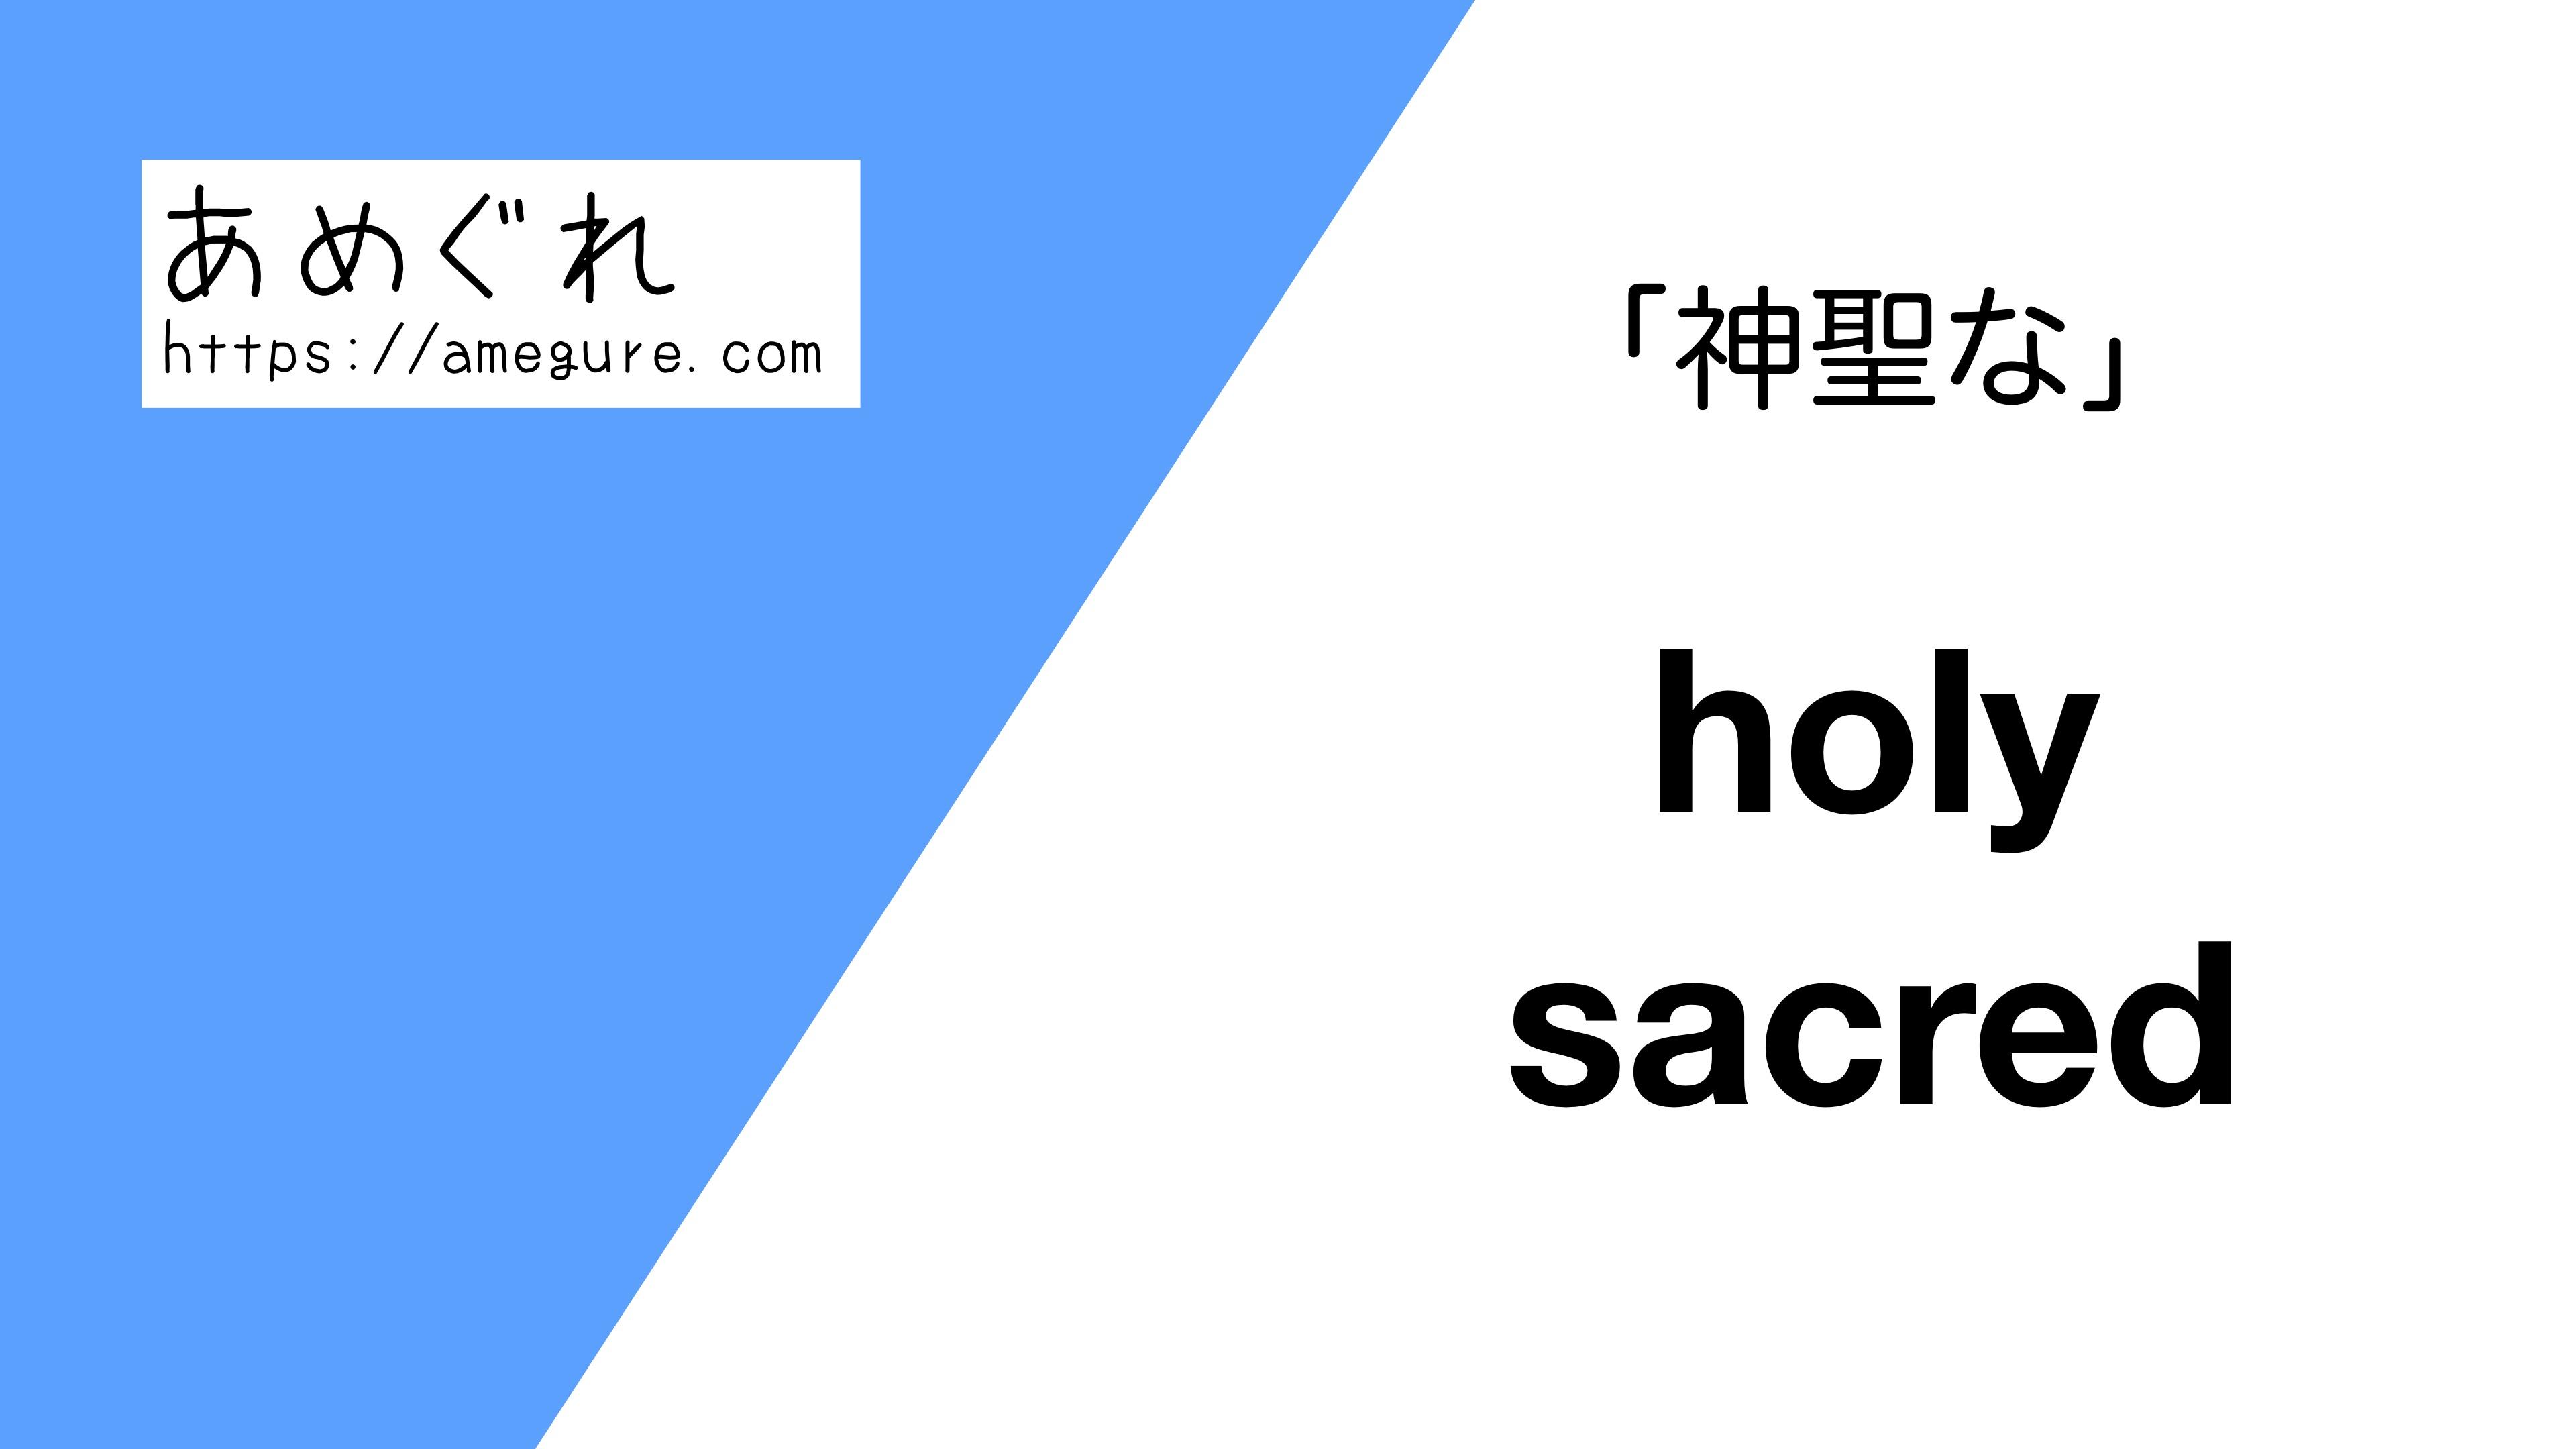 holy-sacred違い